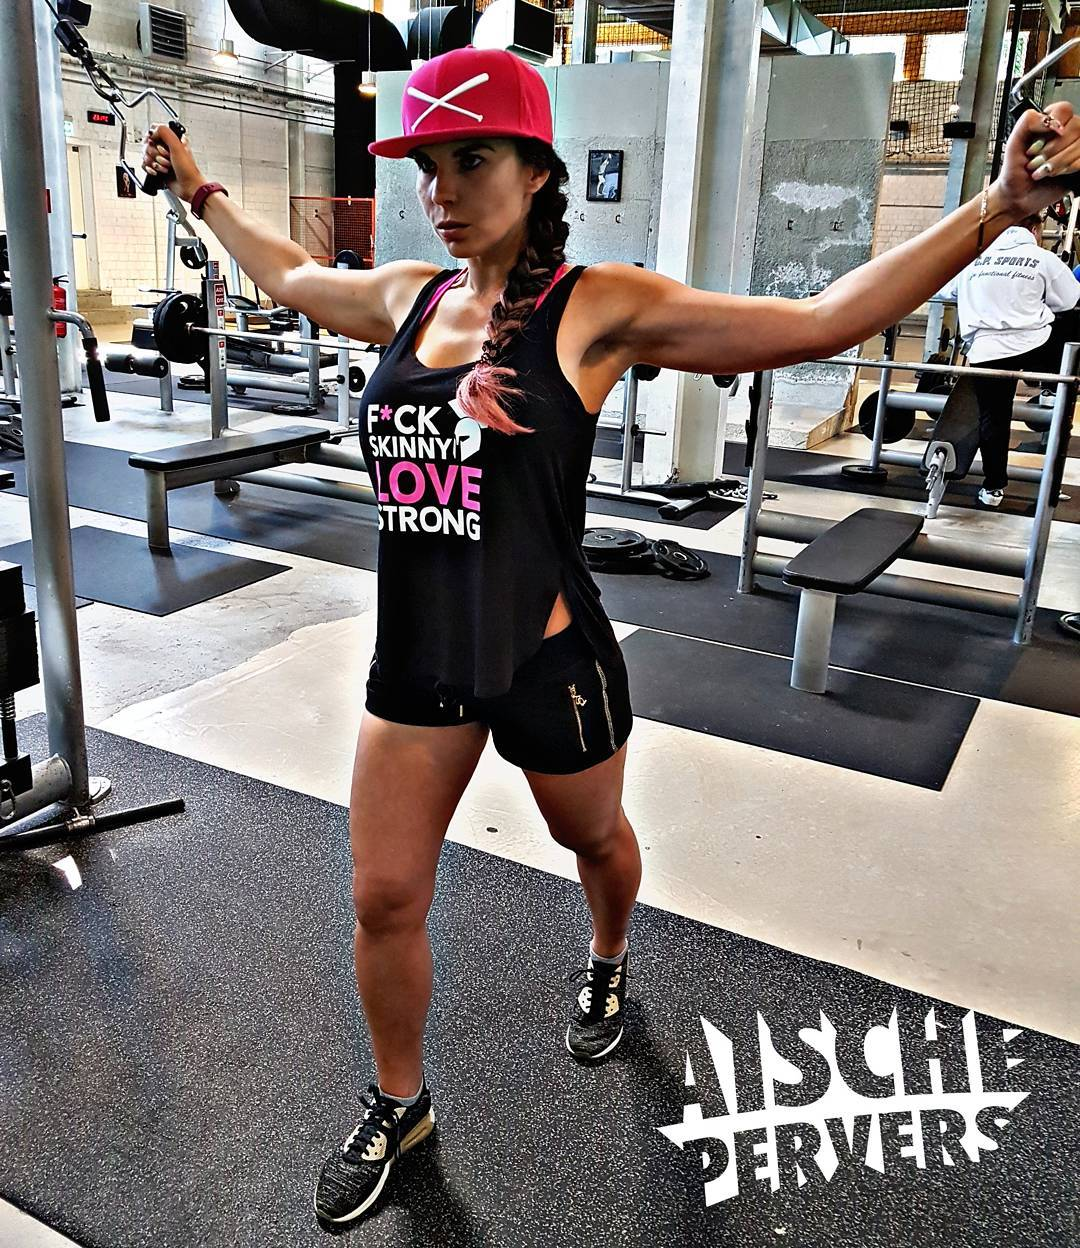 F*ck skinny Love strong ❤❤❤ Endlich wieder im #gym 💪💪💪 Danke an @gymphoman fürs geile Top  #fit #fitness #fitnessmodel #instafit #fitfam #fitnessjunkie #gymfreak #instagood #chest #chestday #Motivation #Workout #longhair #strong #curvygirl #curvy